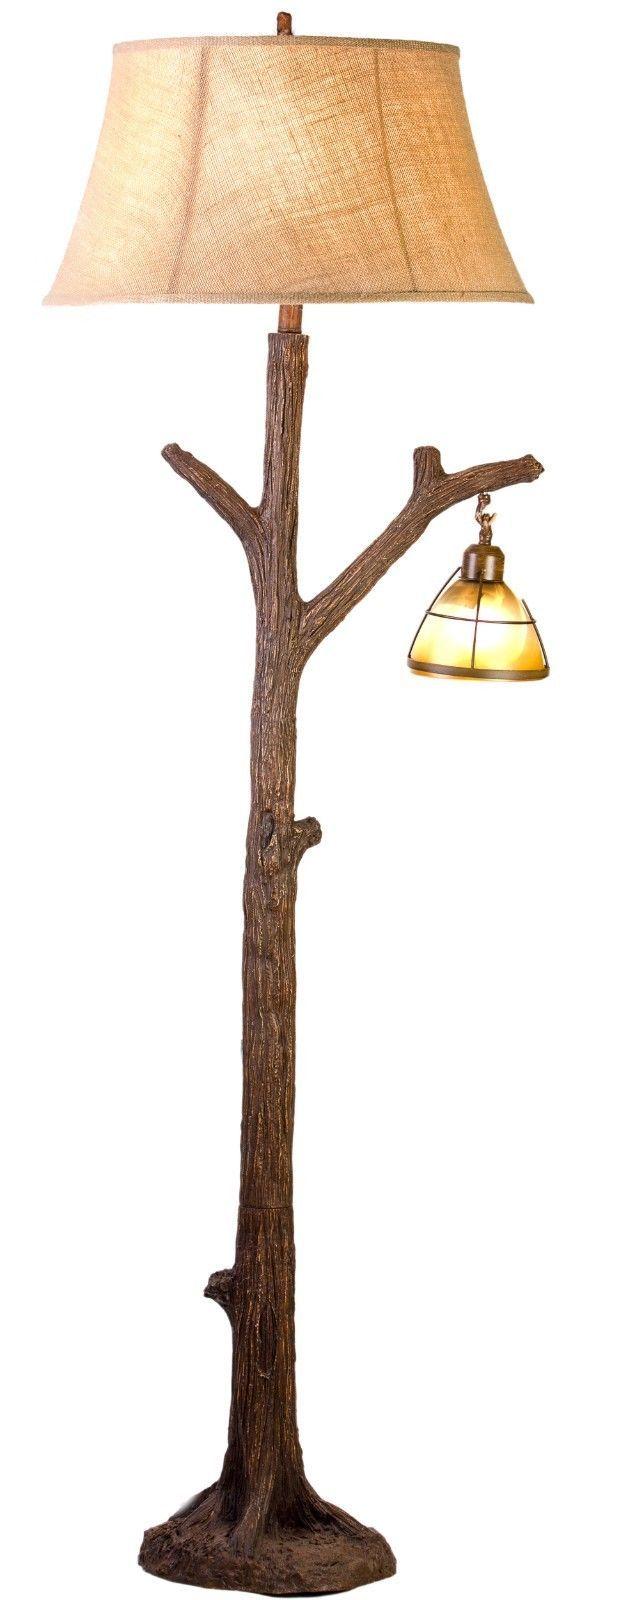 Tree Branch Floor Lamp Rustic Cabin Lodge Decor Glass Lantern Night Light - CFL1